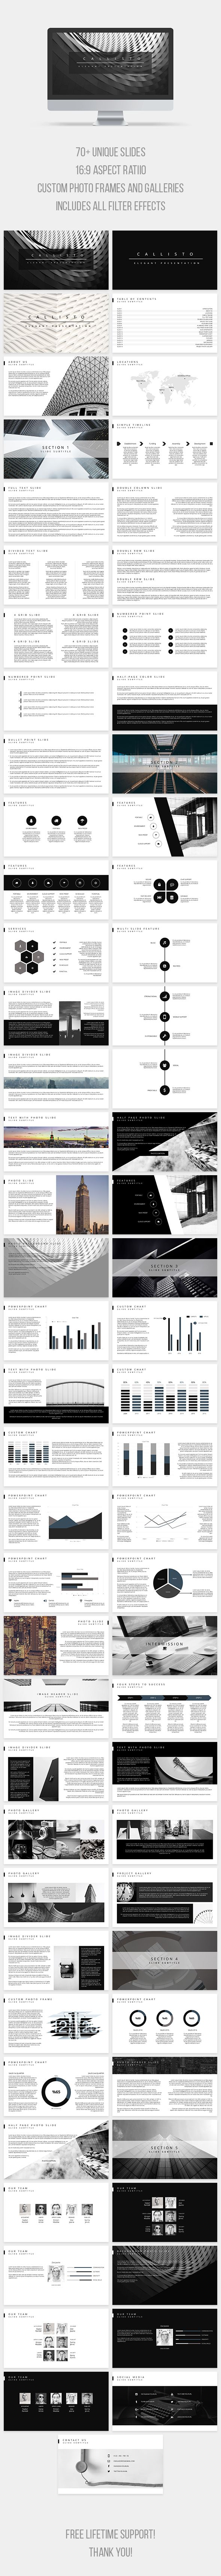 Callisto PowerPoint Template. Download here: https://graphicriver.net/item/callisto-powerpoint-template/17234925?ref=ksioks